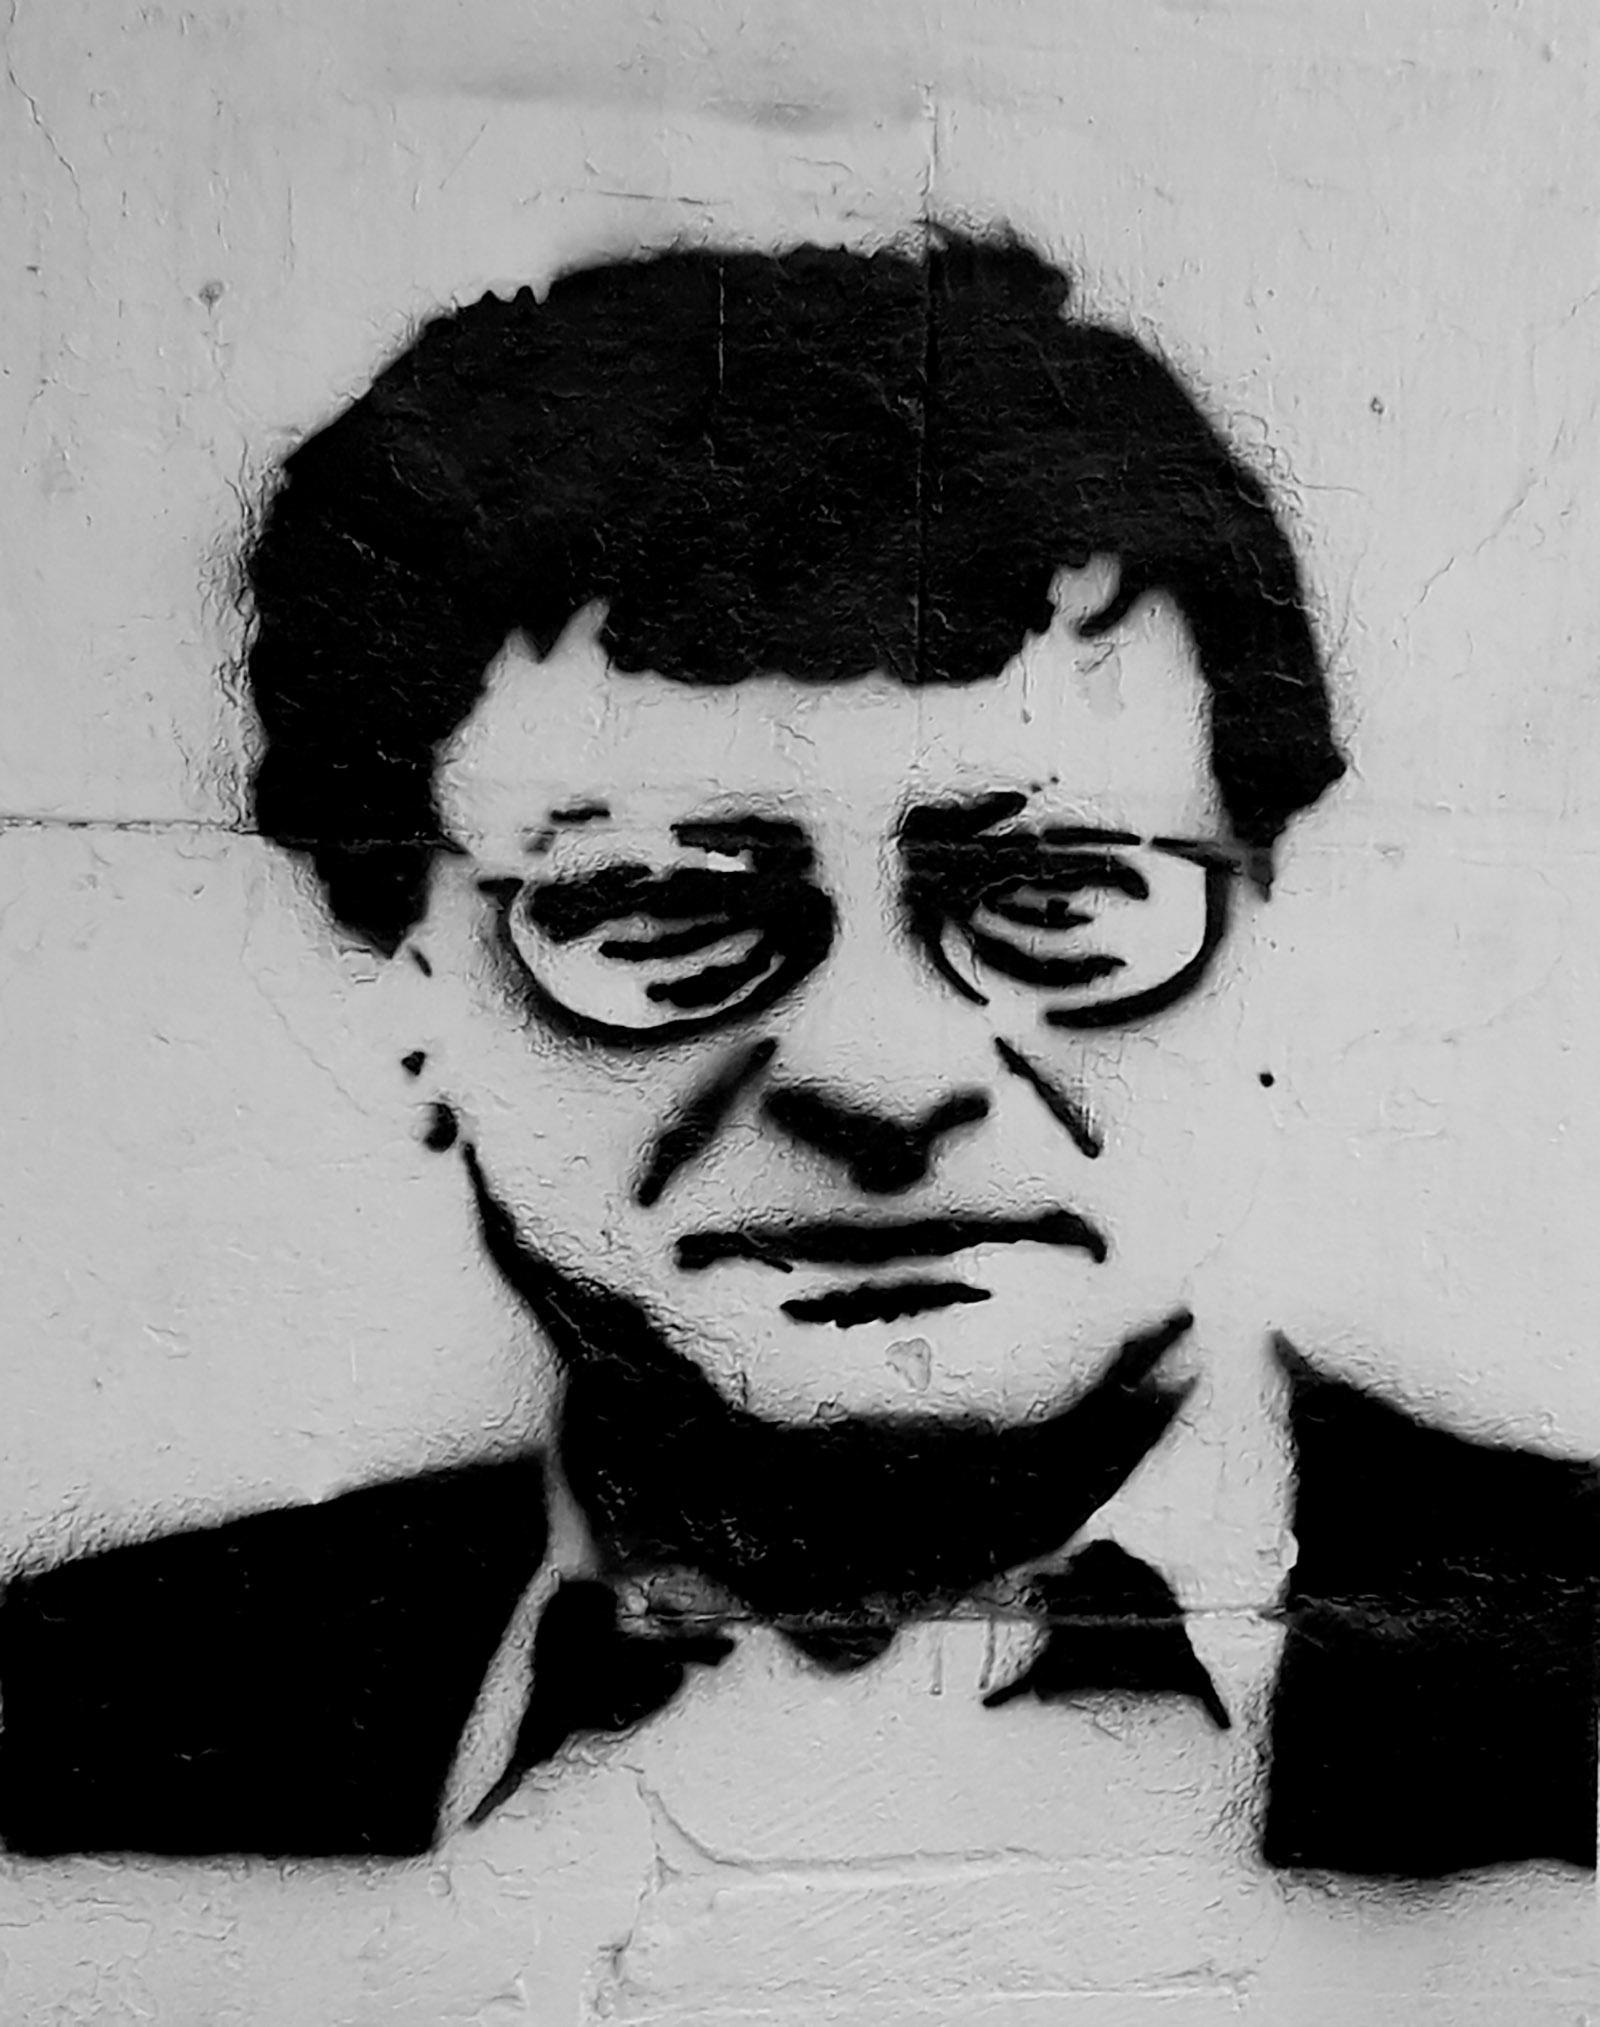 Graffiti of Mahmoud Darwish, Tunisia, 2017